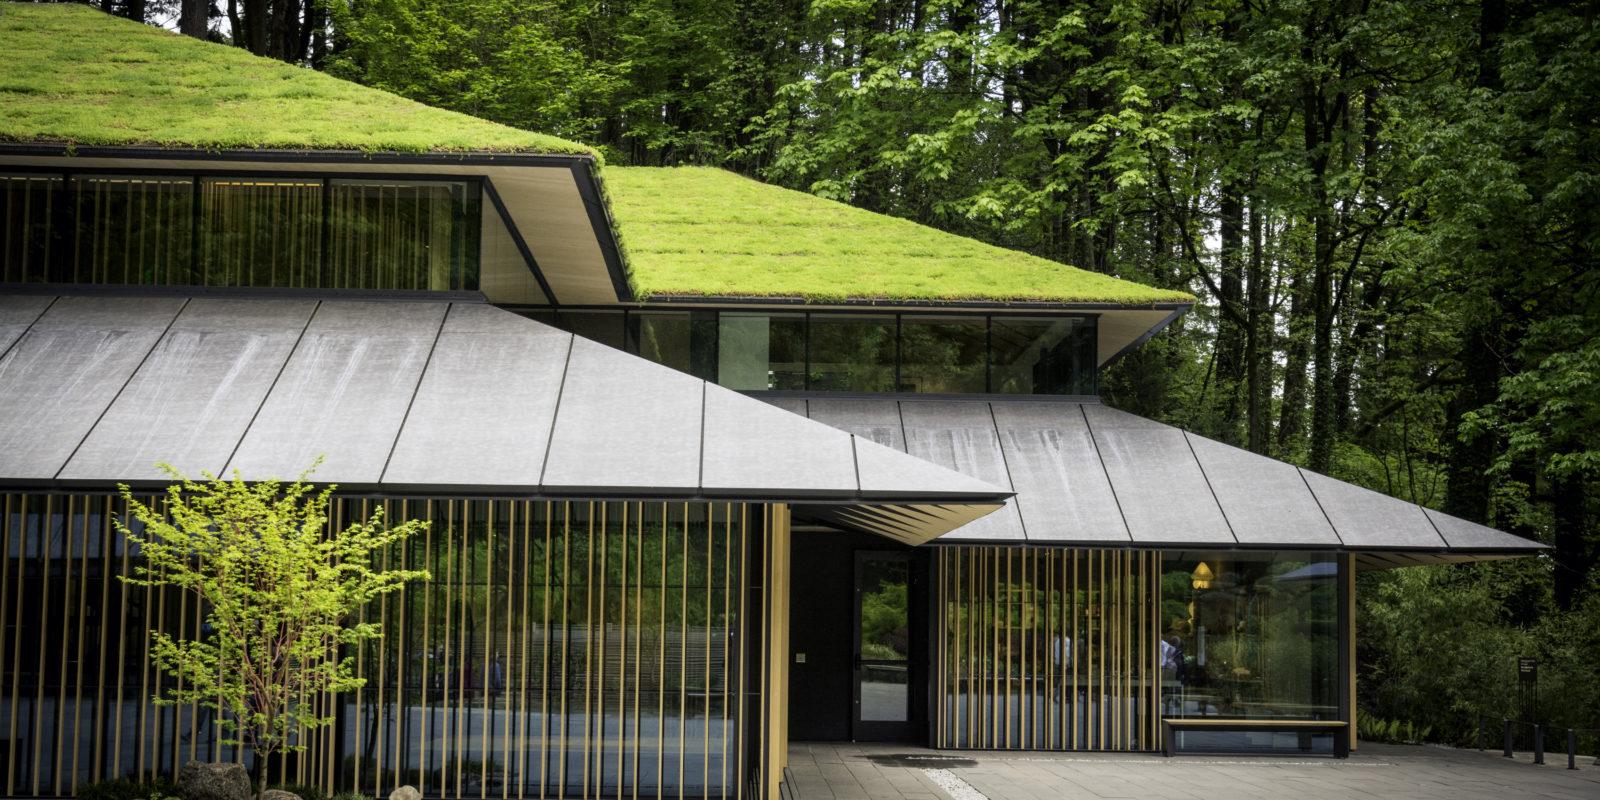 Jordan Schnitzer Japanese Arts Learning Center